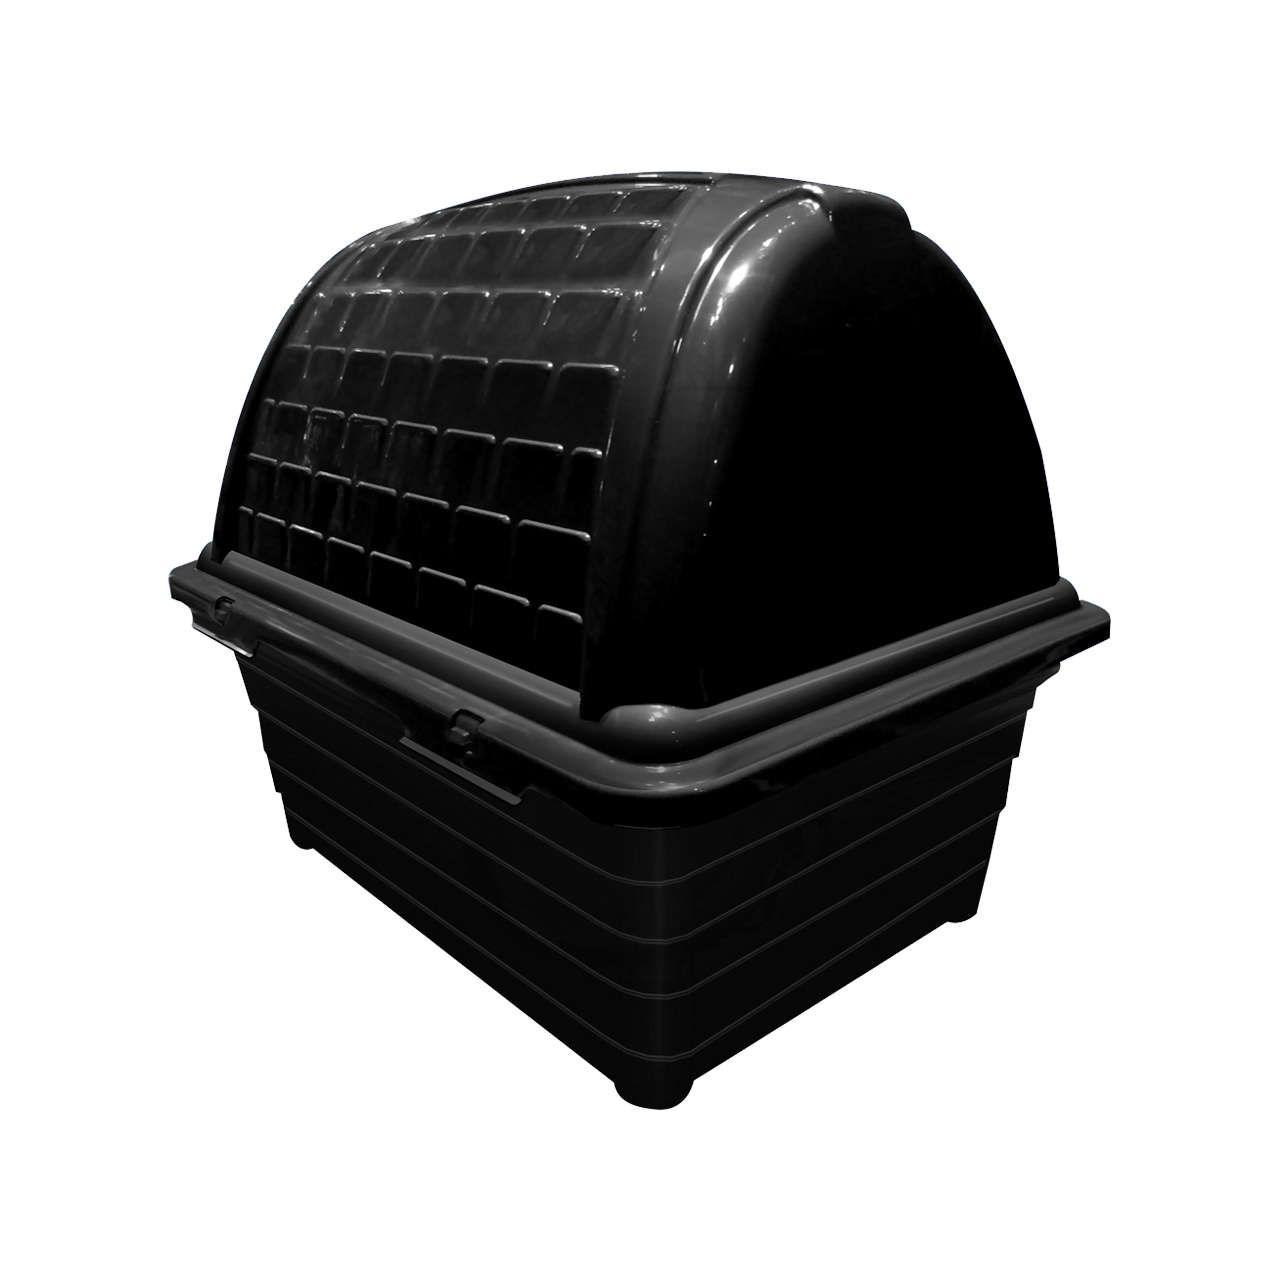 CASINHA PLAST. FURACÃO PET IGLU BLACK - N01